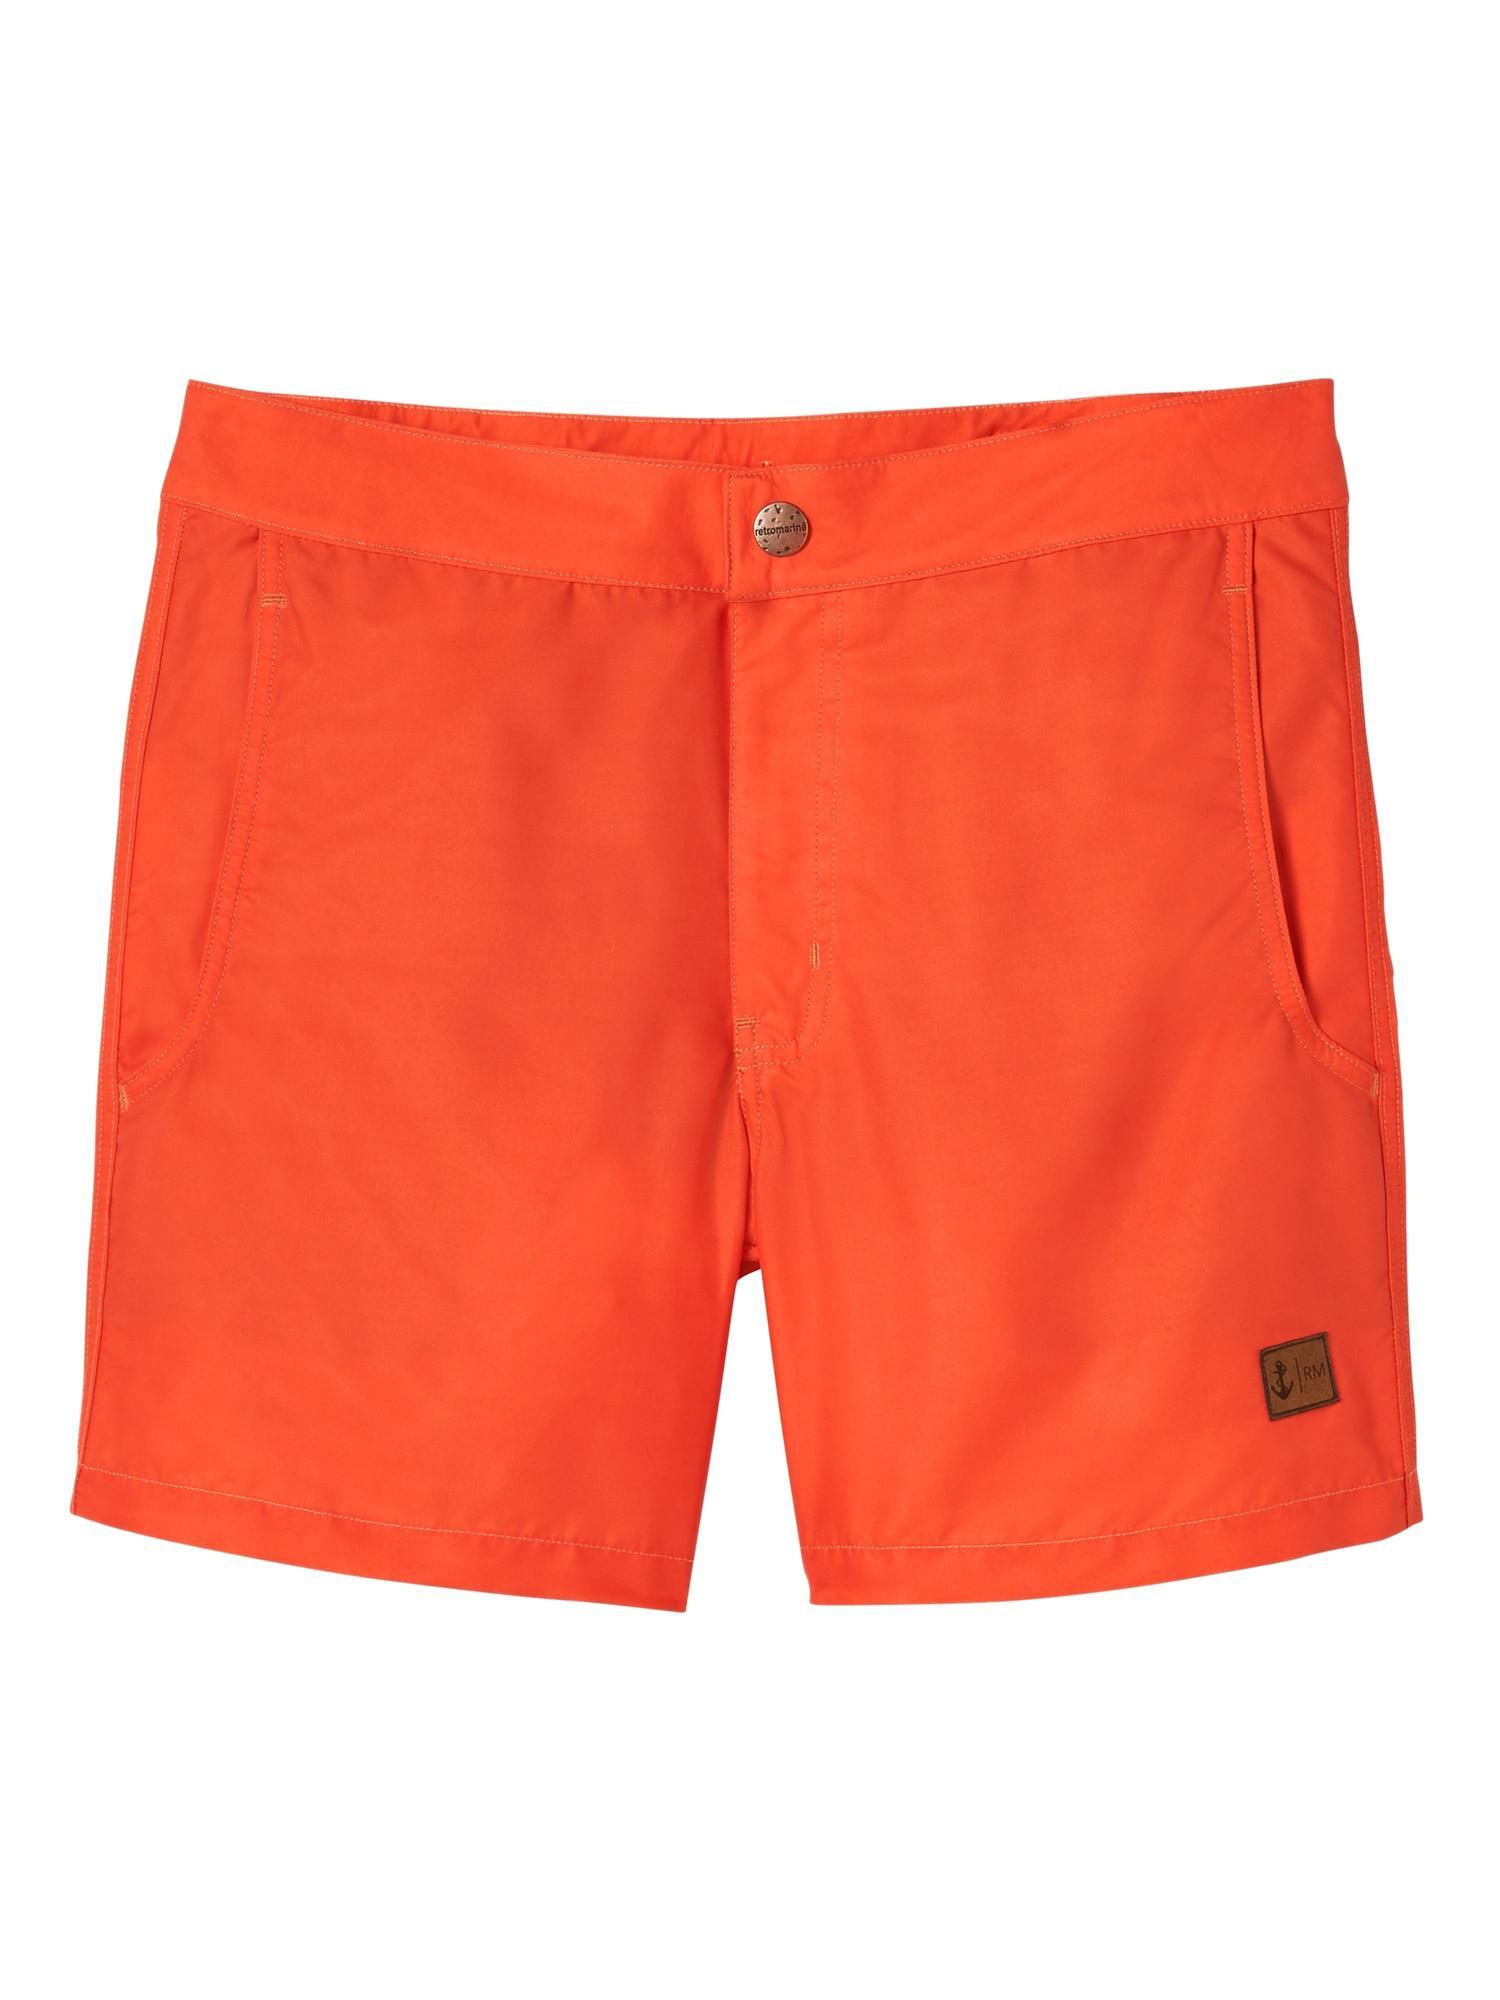 5bb0a69ba8973 Lyst - Banana Republic Retromarine | Solid Swim Short in Orange for Men